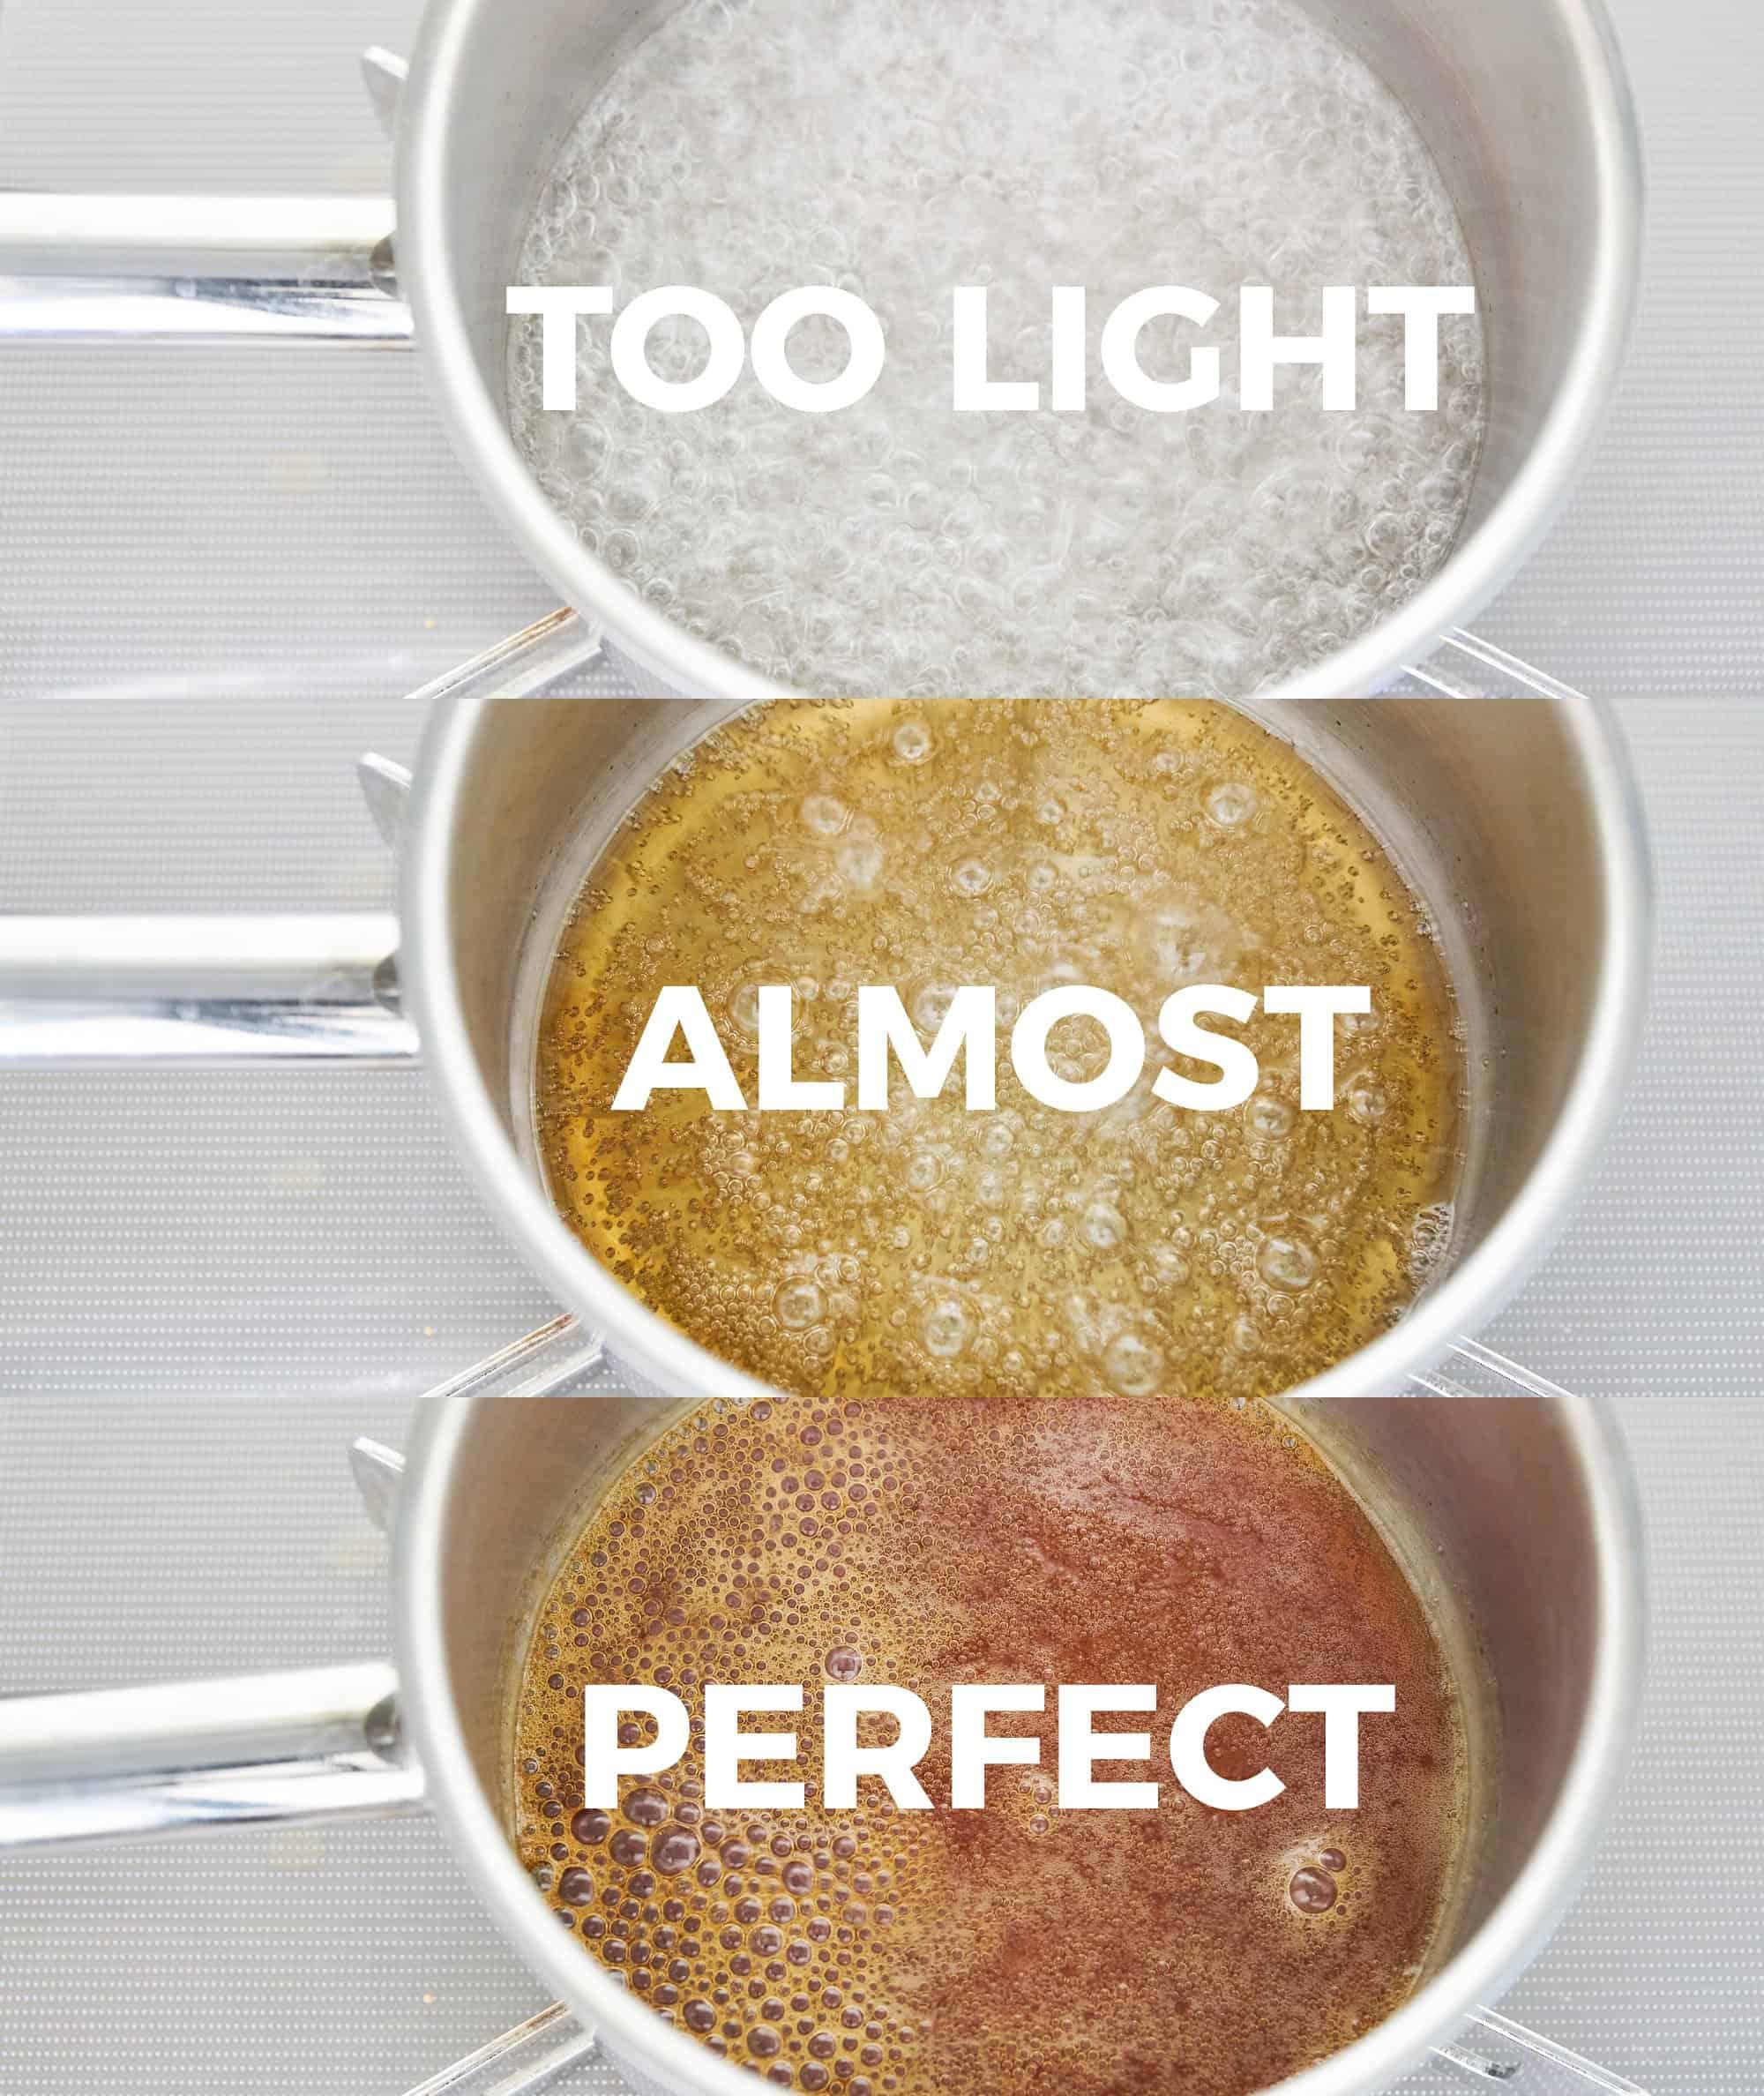 Stages for caramelization of sugar.